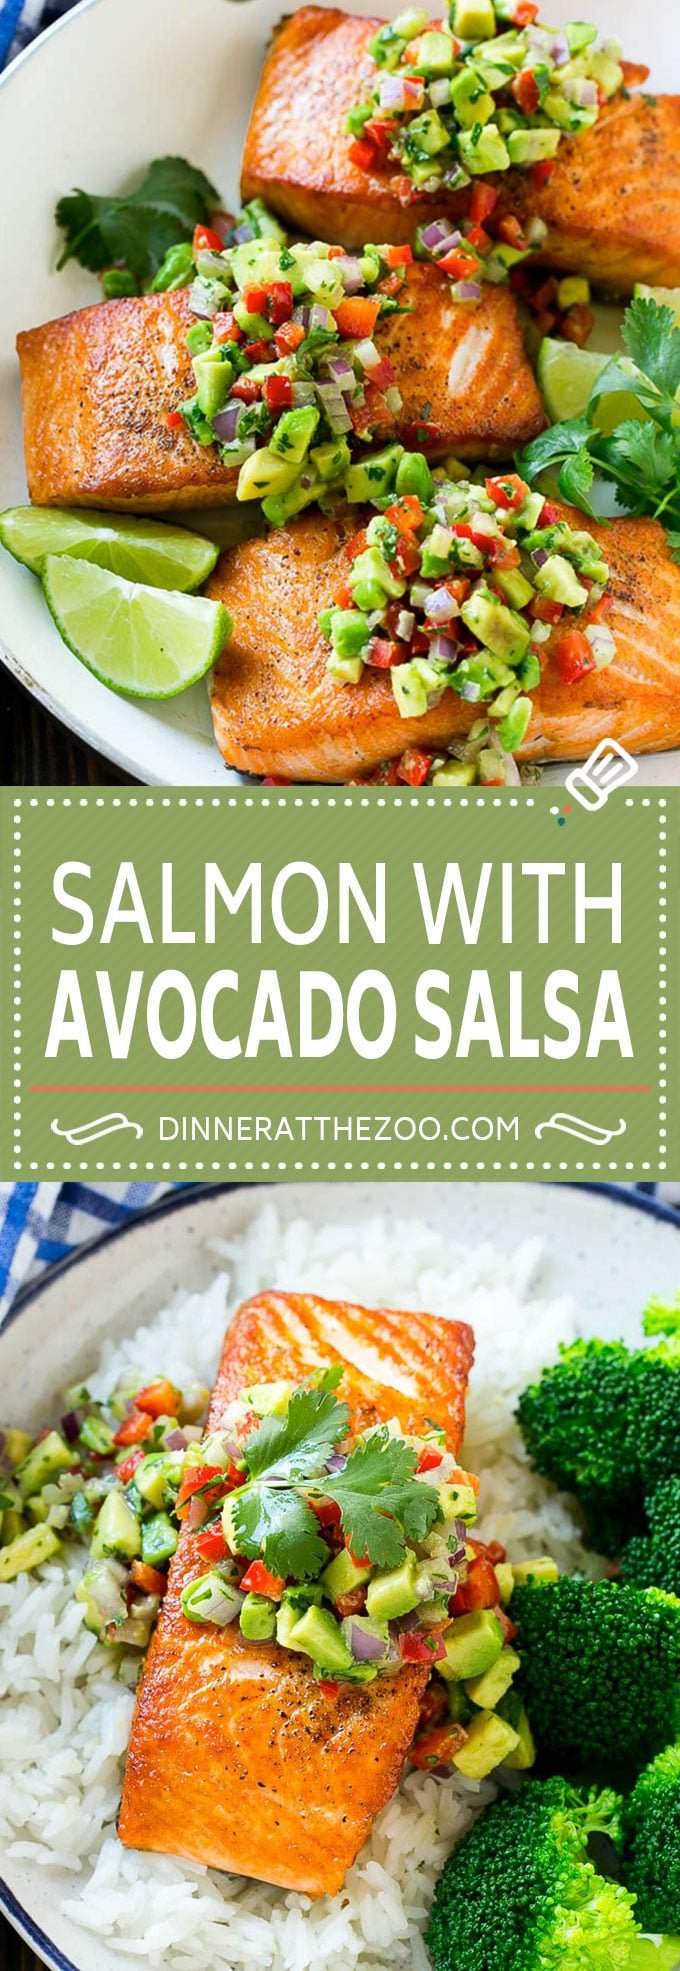 Salmon with Avocado Salsa Recipe | Seared Salmon Recipe | Healthy Salmon Recipe #salmon #avocado #salsa #seafood #lowcarb #keto #glutenfree #healthy #dinneratthezoo